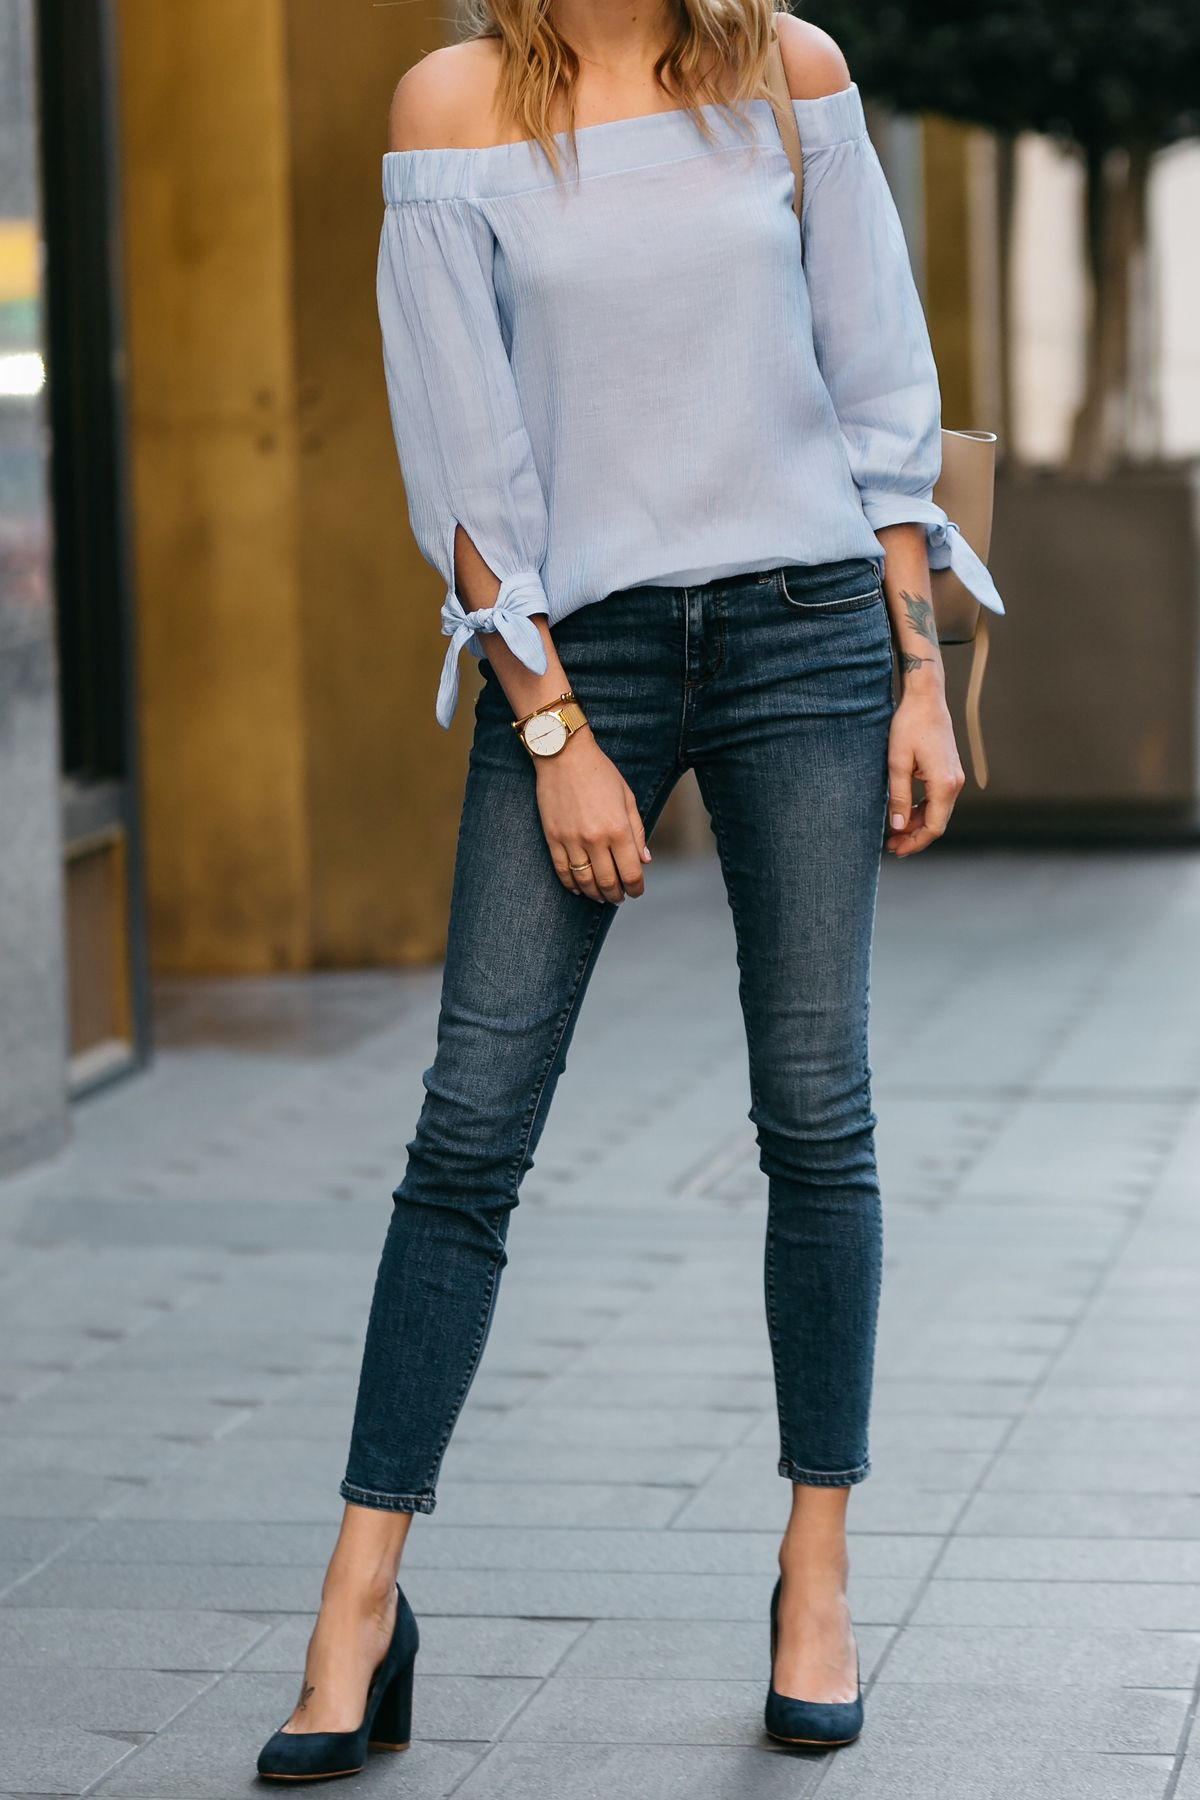 124857b3427ac Fashion Jackson, Dallas Blogger, Fashion Blogger, Street Style, Ann Taylor  Blue Tie Off-the-shoulder Top, Denim Skinny Jeans, Navy Suede Block Heel  Pumps, ...